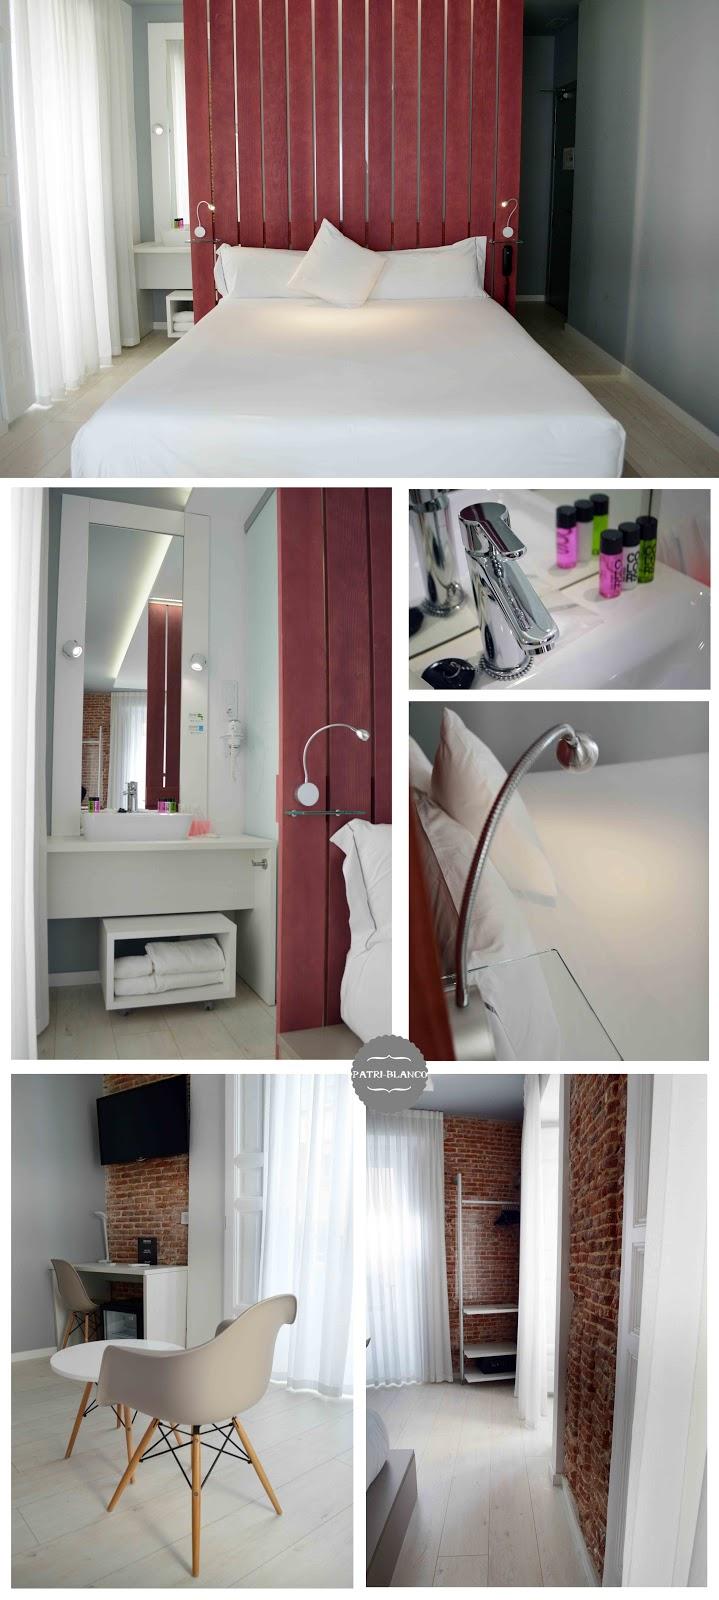 Hotel Sidorme Fuencarral52 Madrid